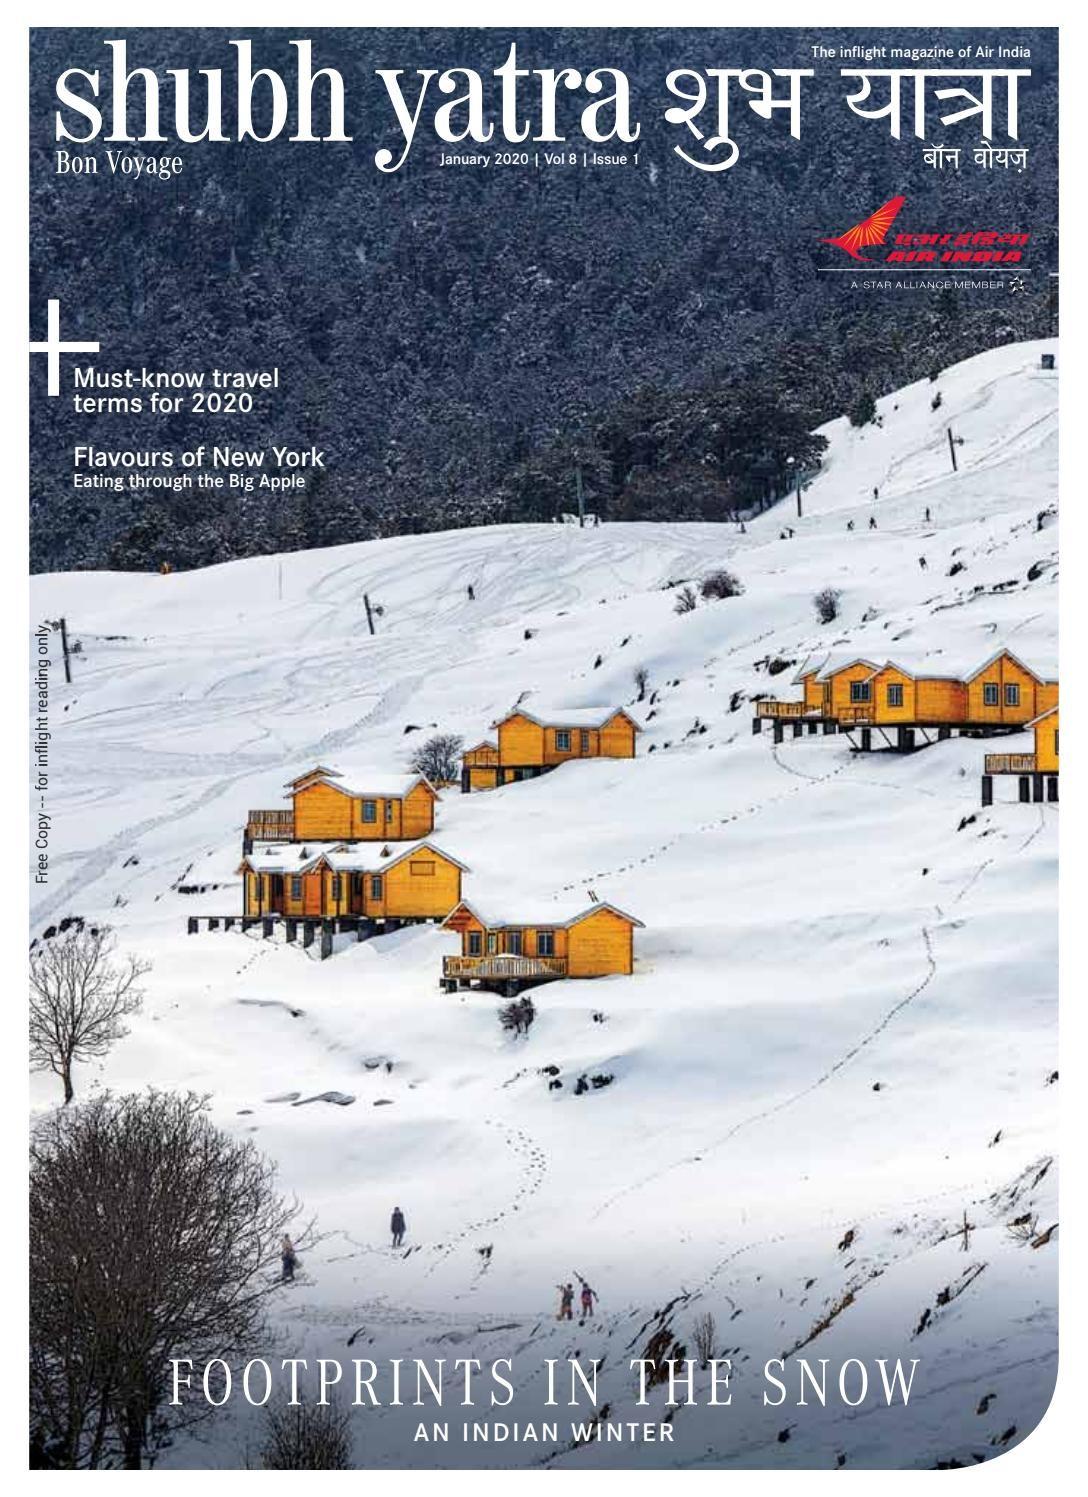 Shubh Yatra Inflight Magazine Air India January 2020 in